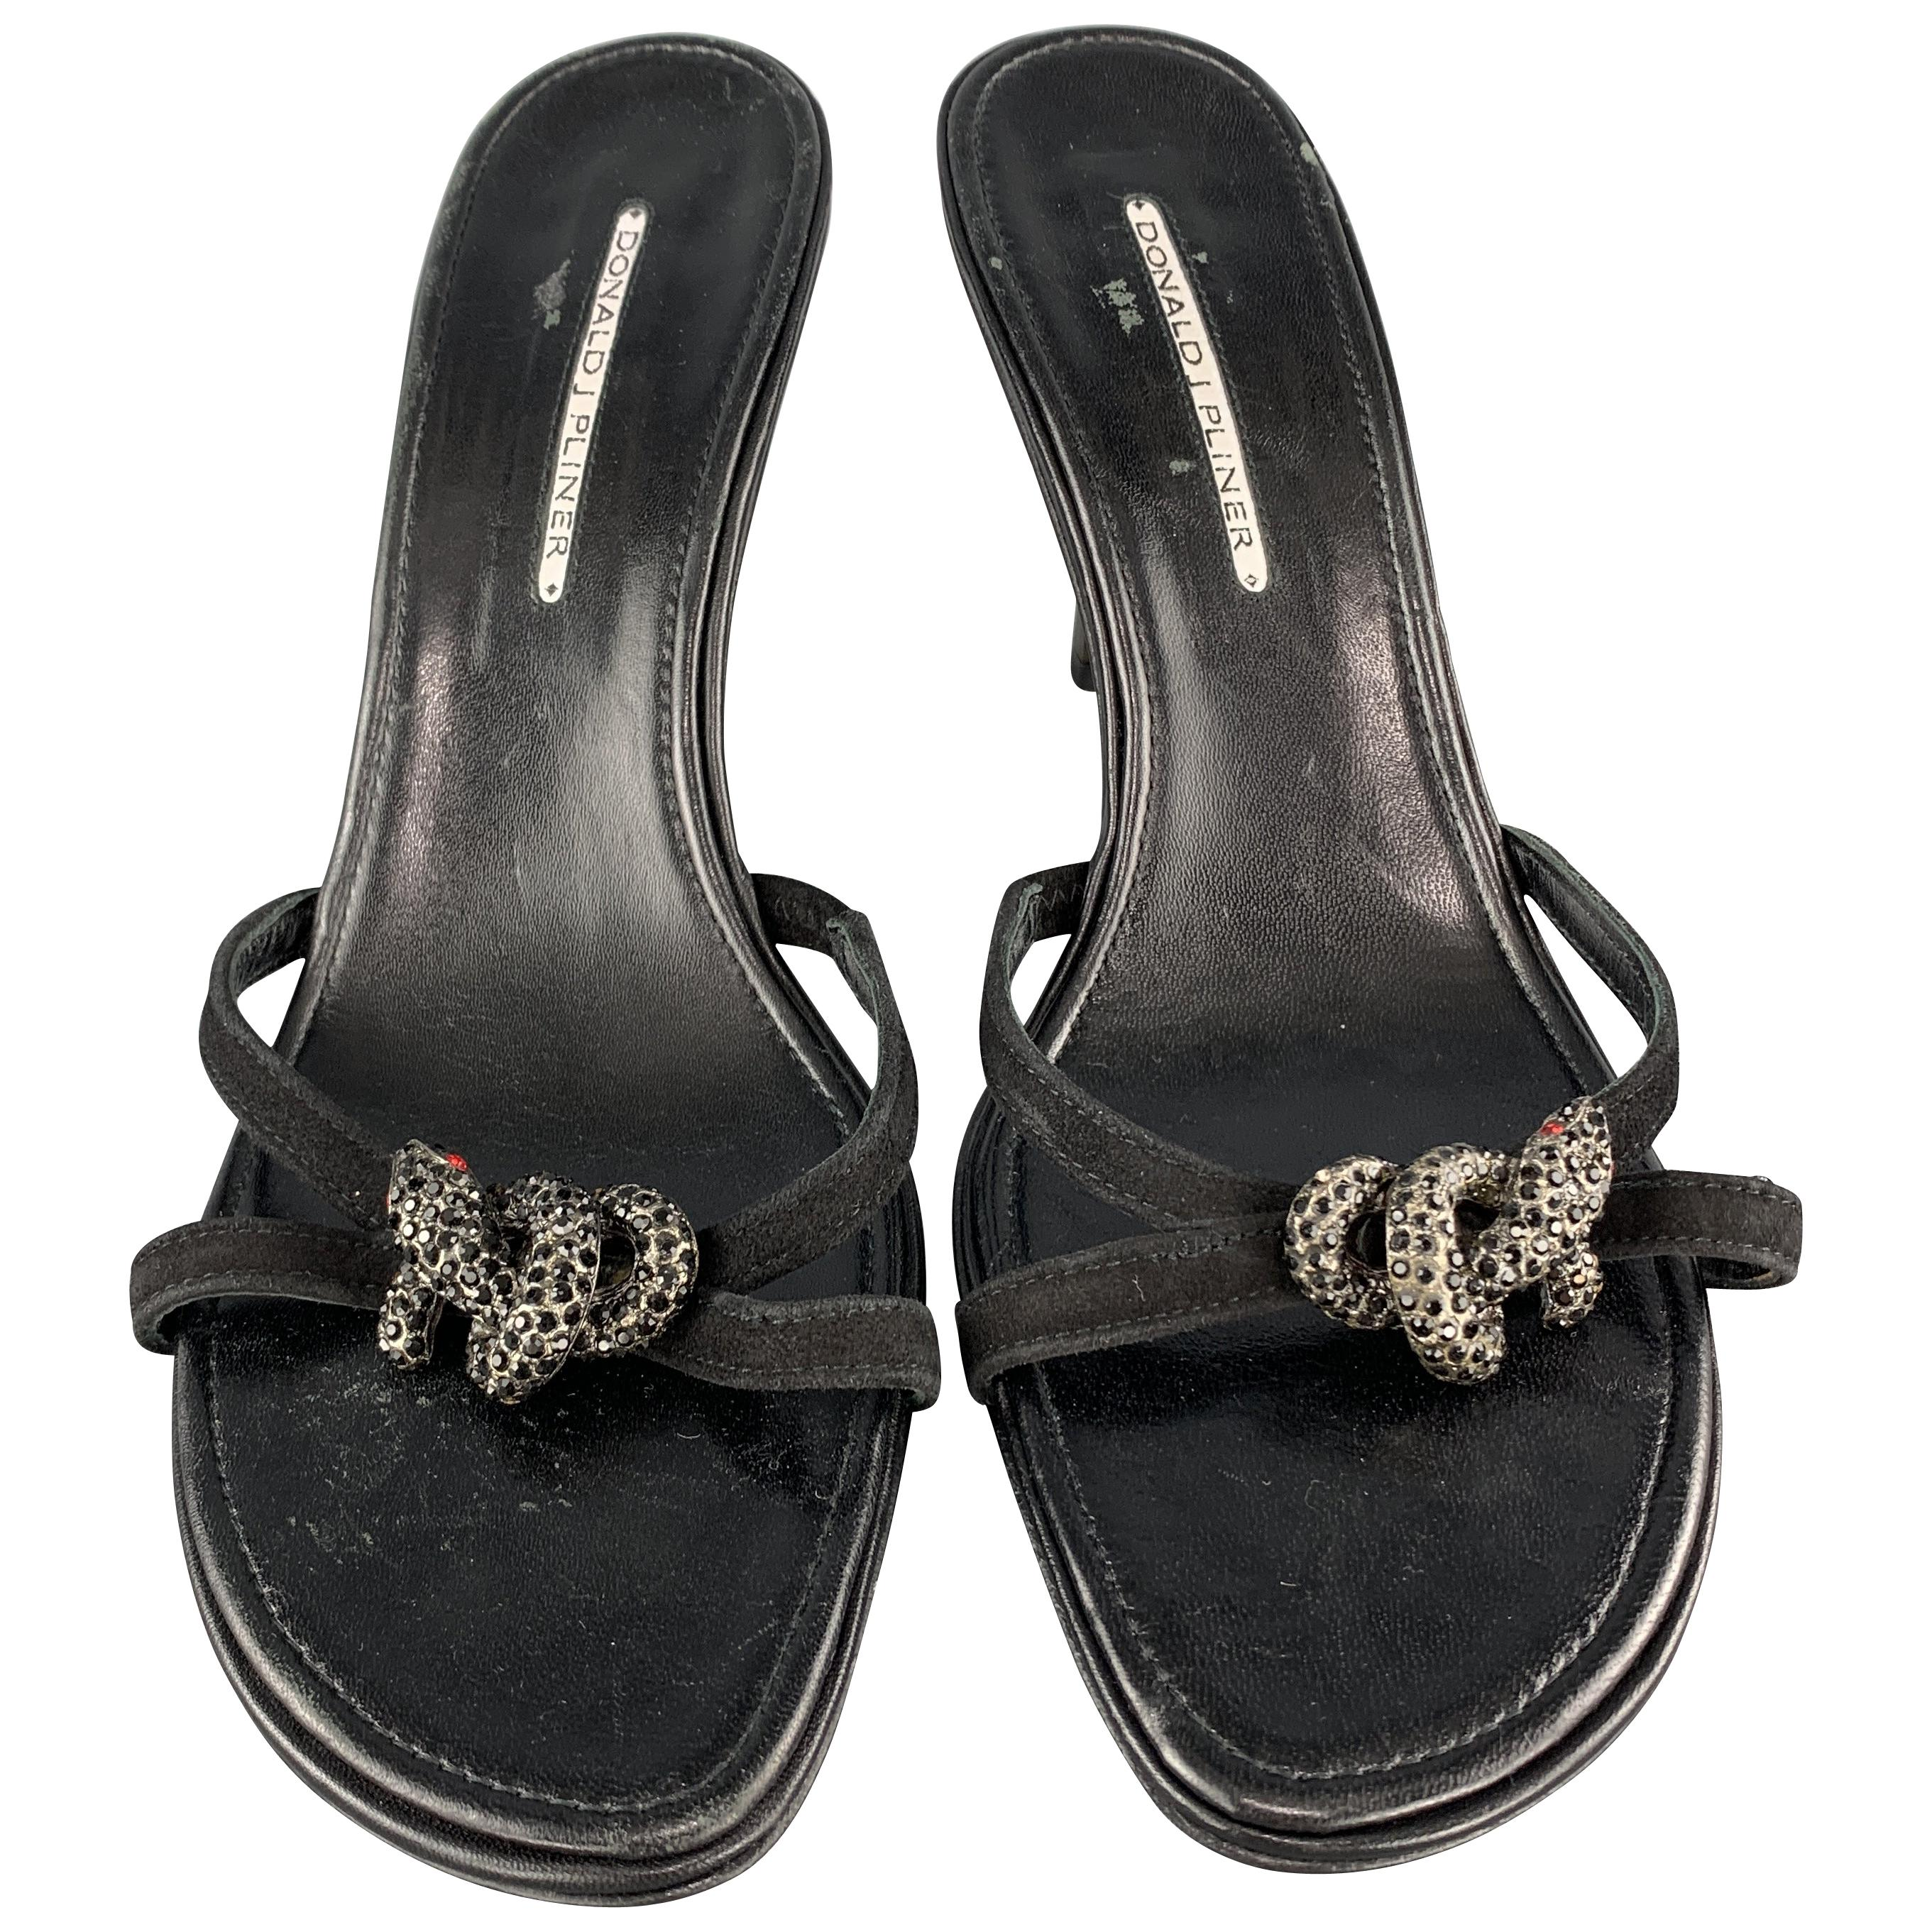 DONALD J PLINER Size 11.5 Black Leather Rhinestone Snake Strap Mule Sandals